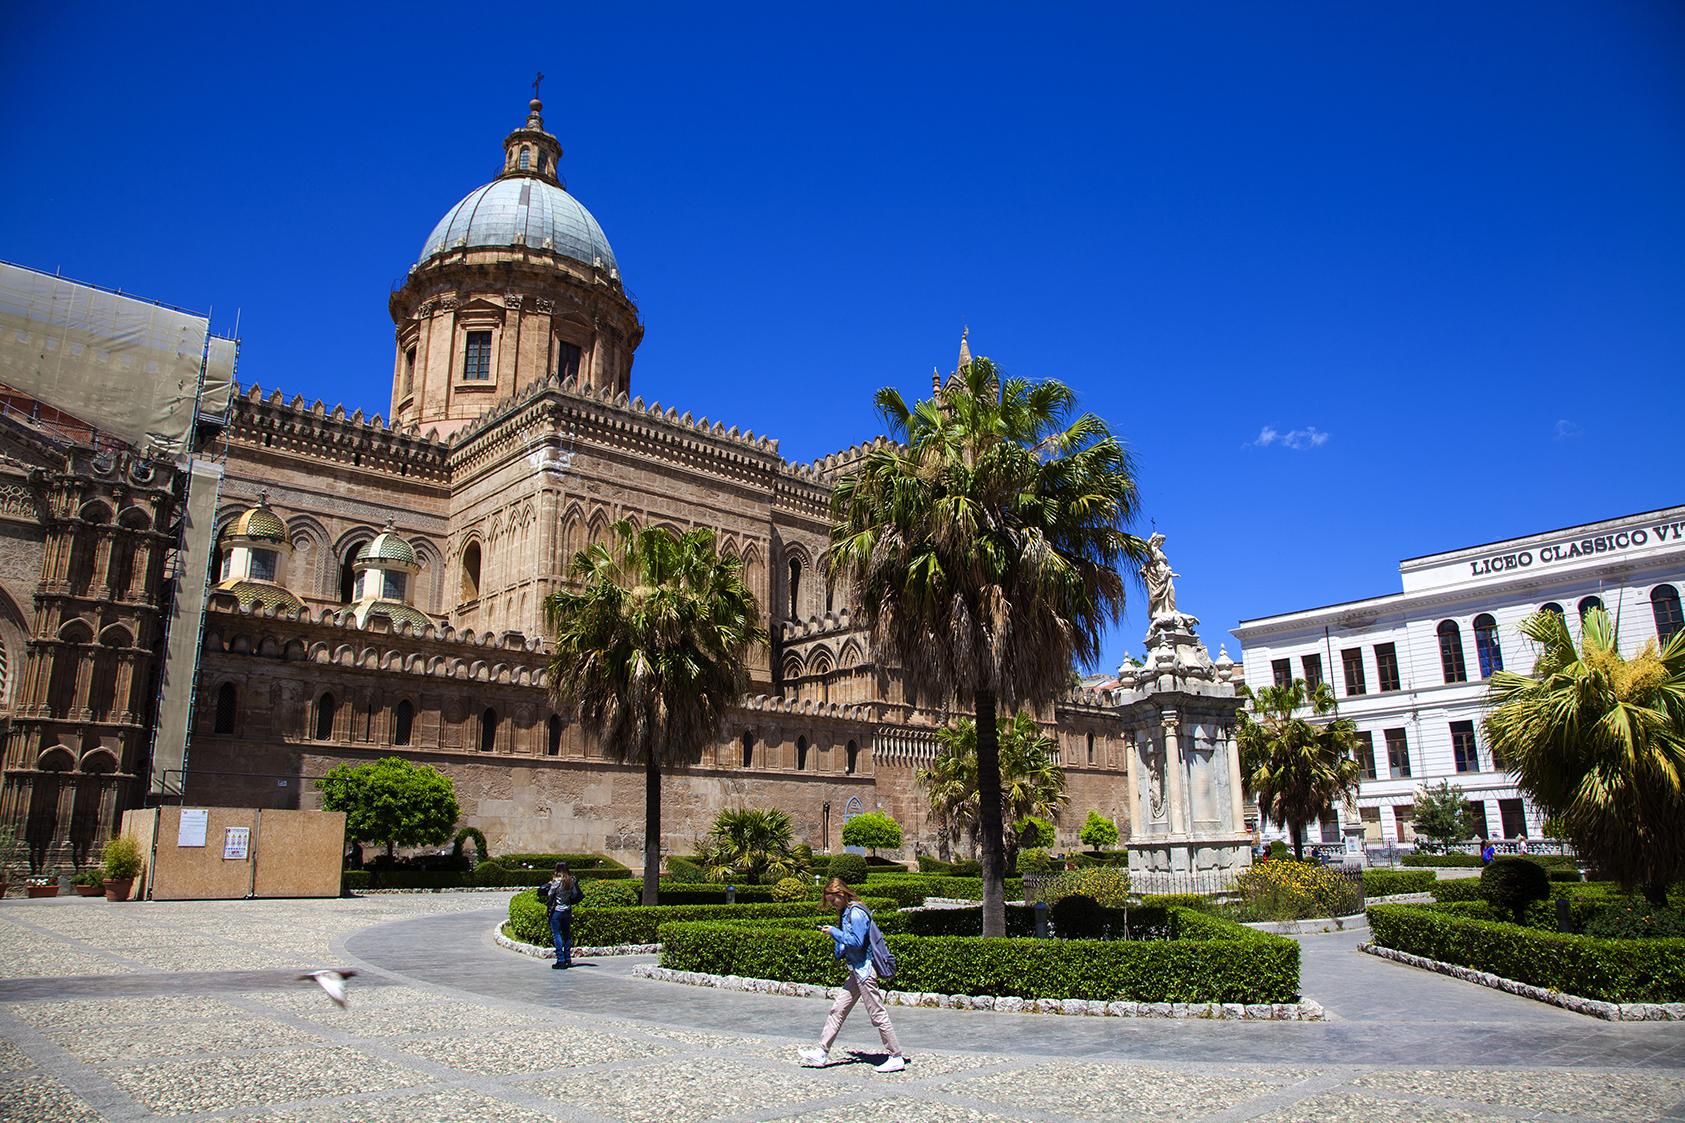 square in Palermo